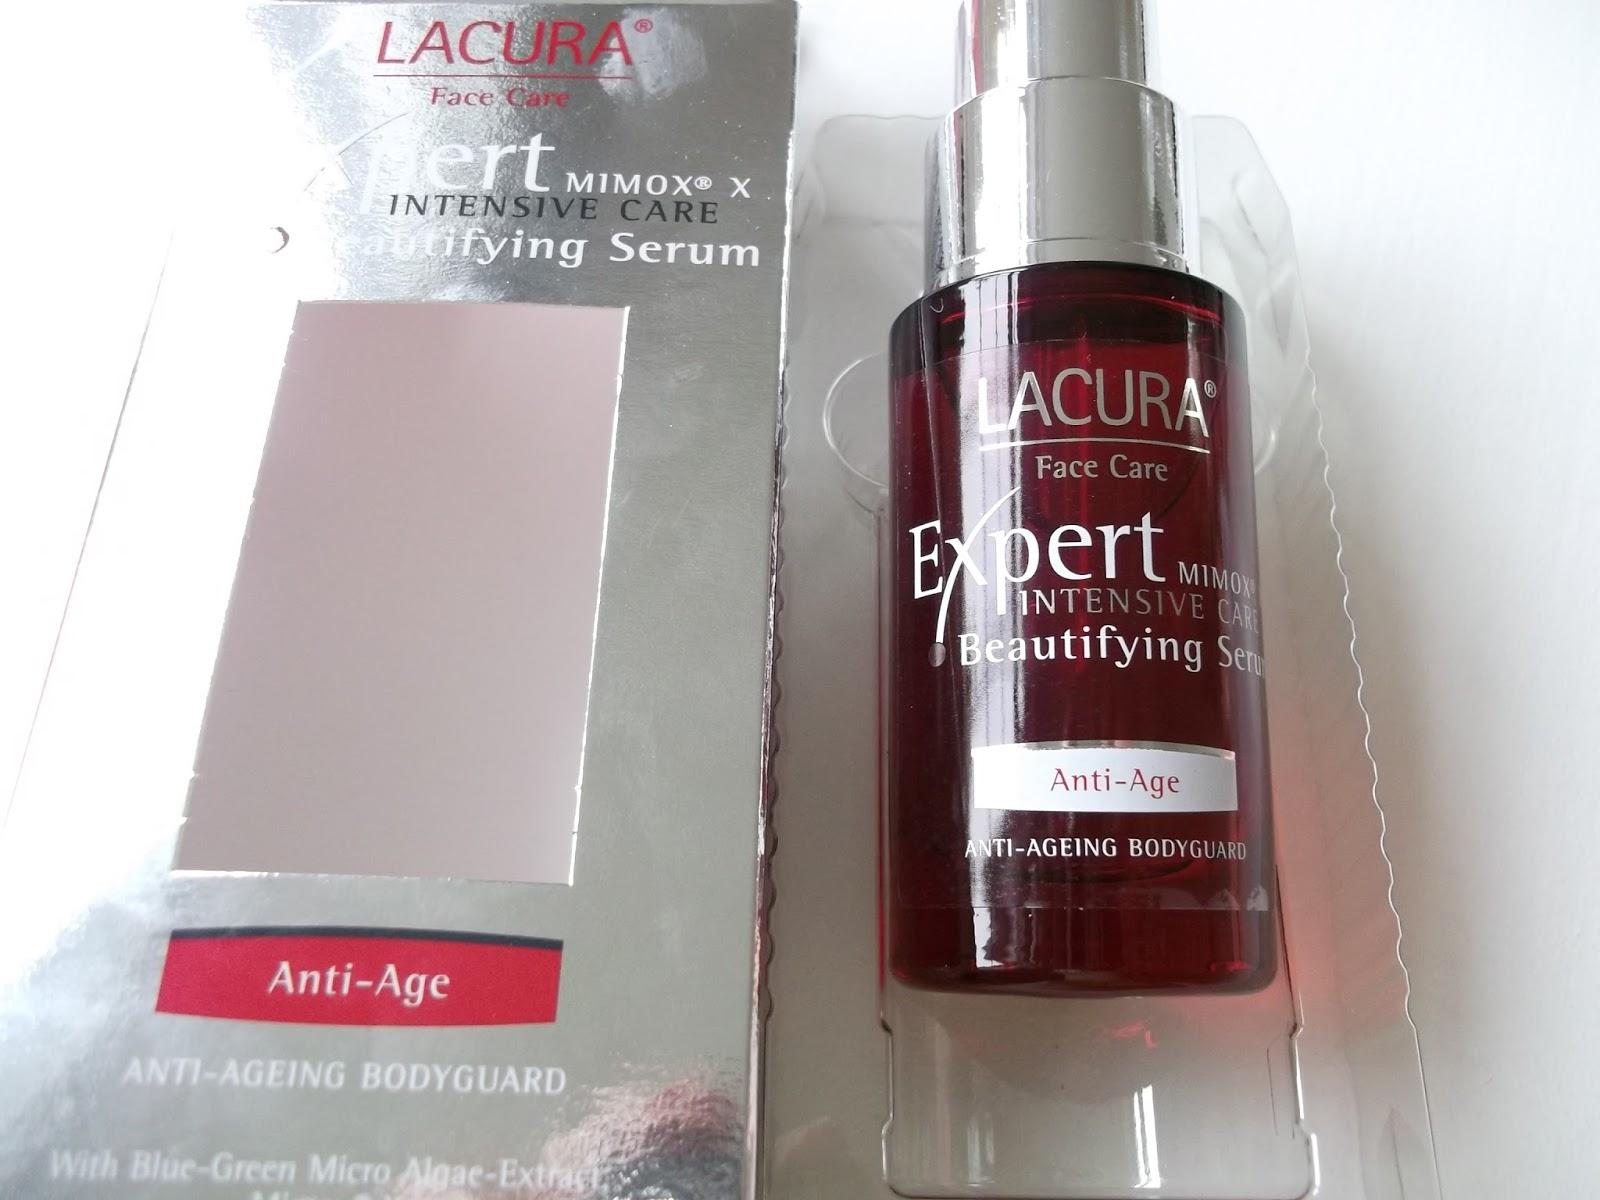 Lacura Skin Care Reviews